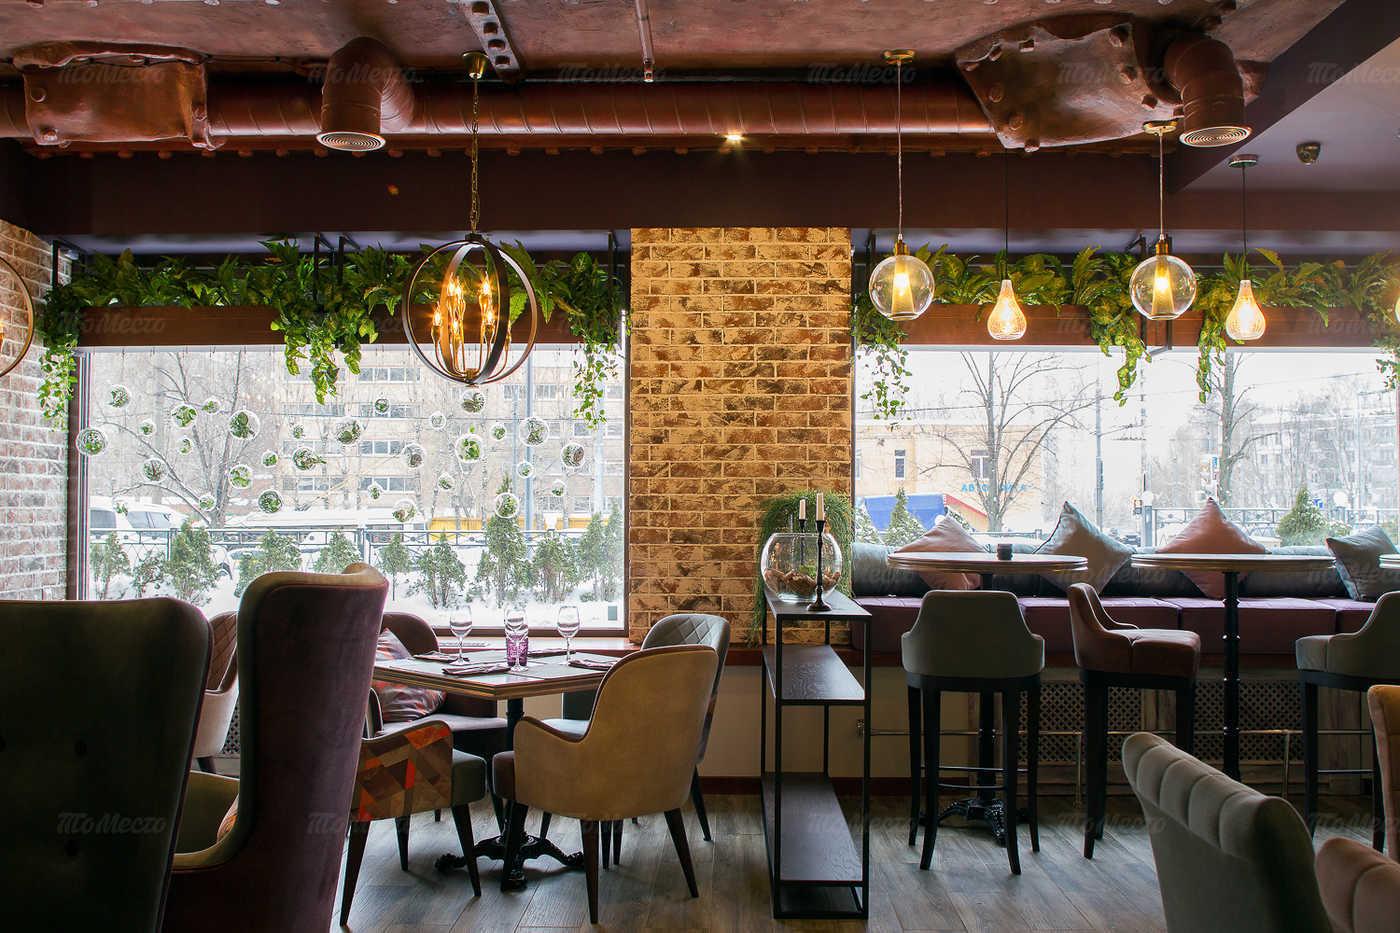 Ресторан La Carta. Москва Херсонская ул., д. 43